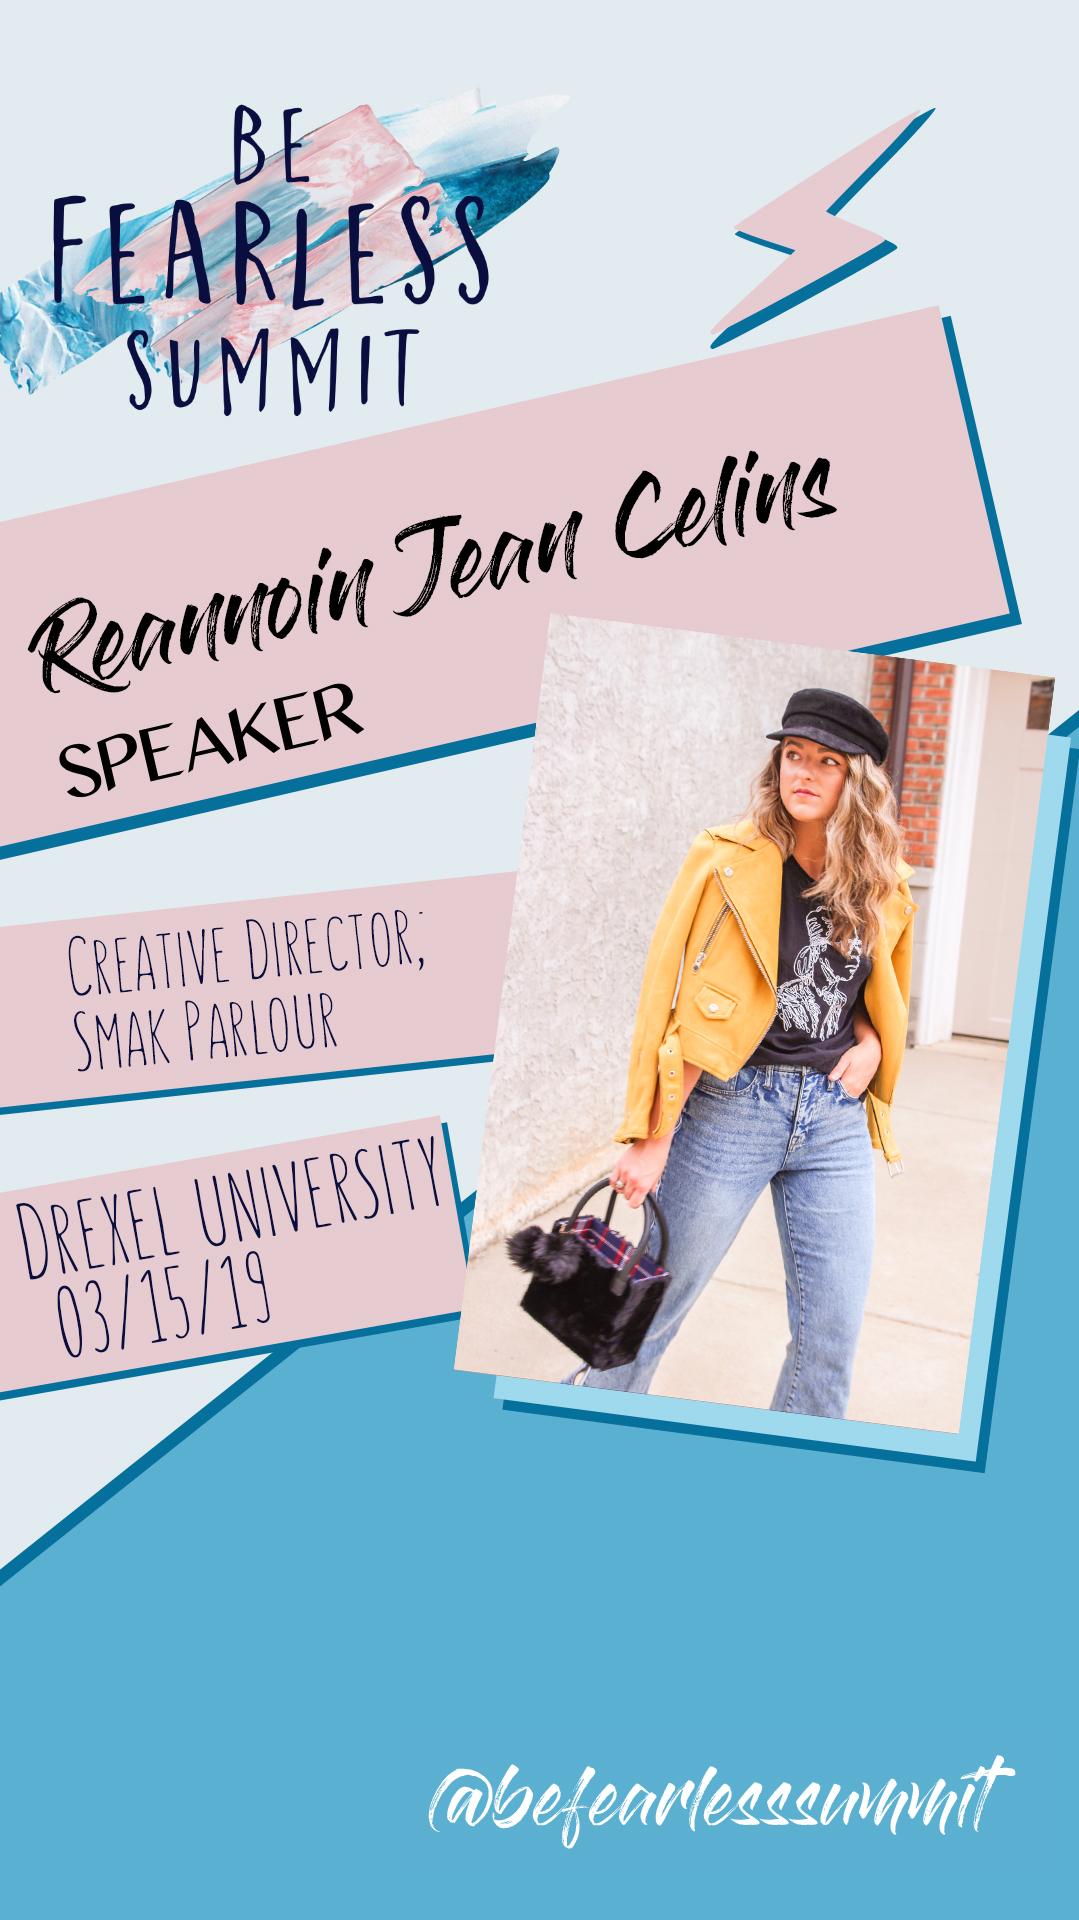 Reannoin Jean Celins _new (1).jpg